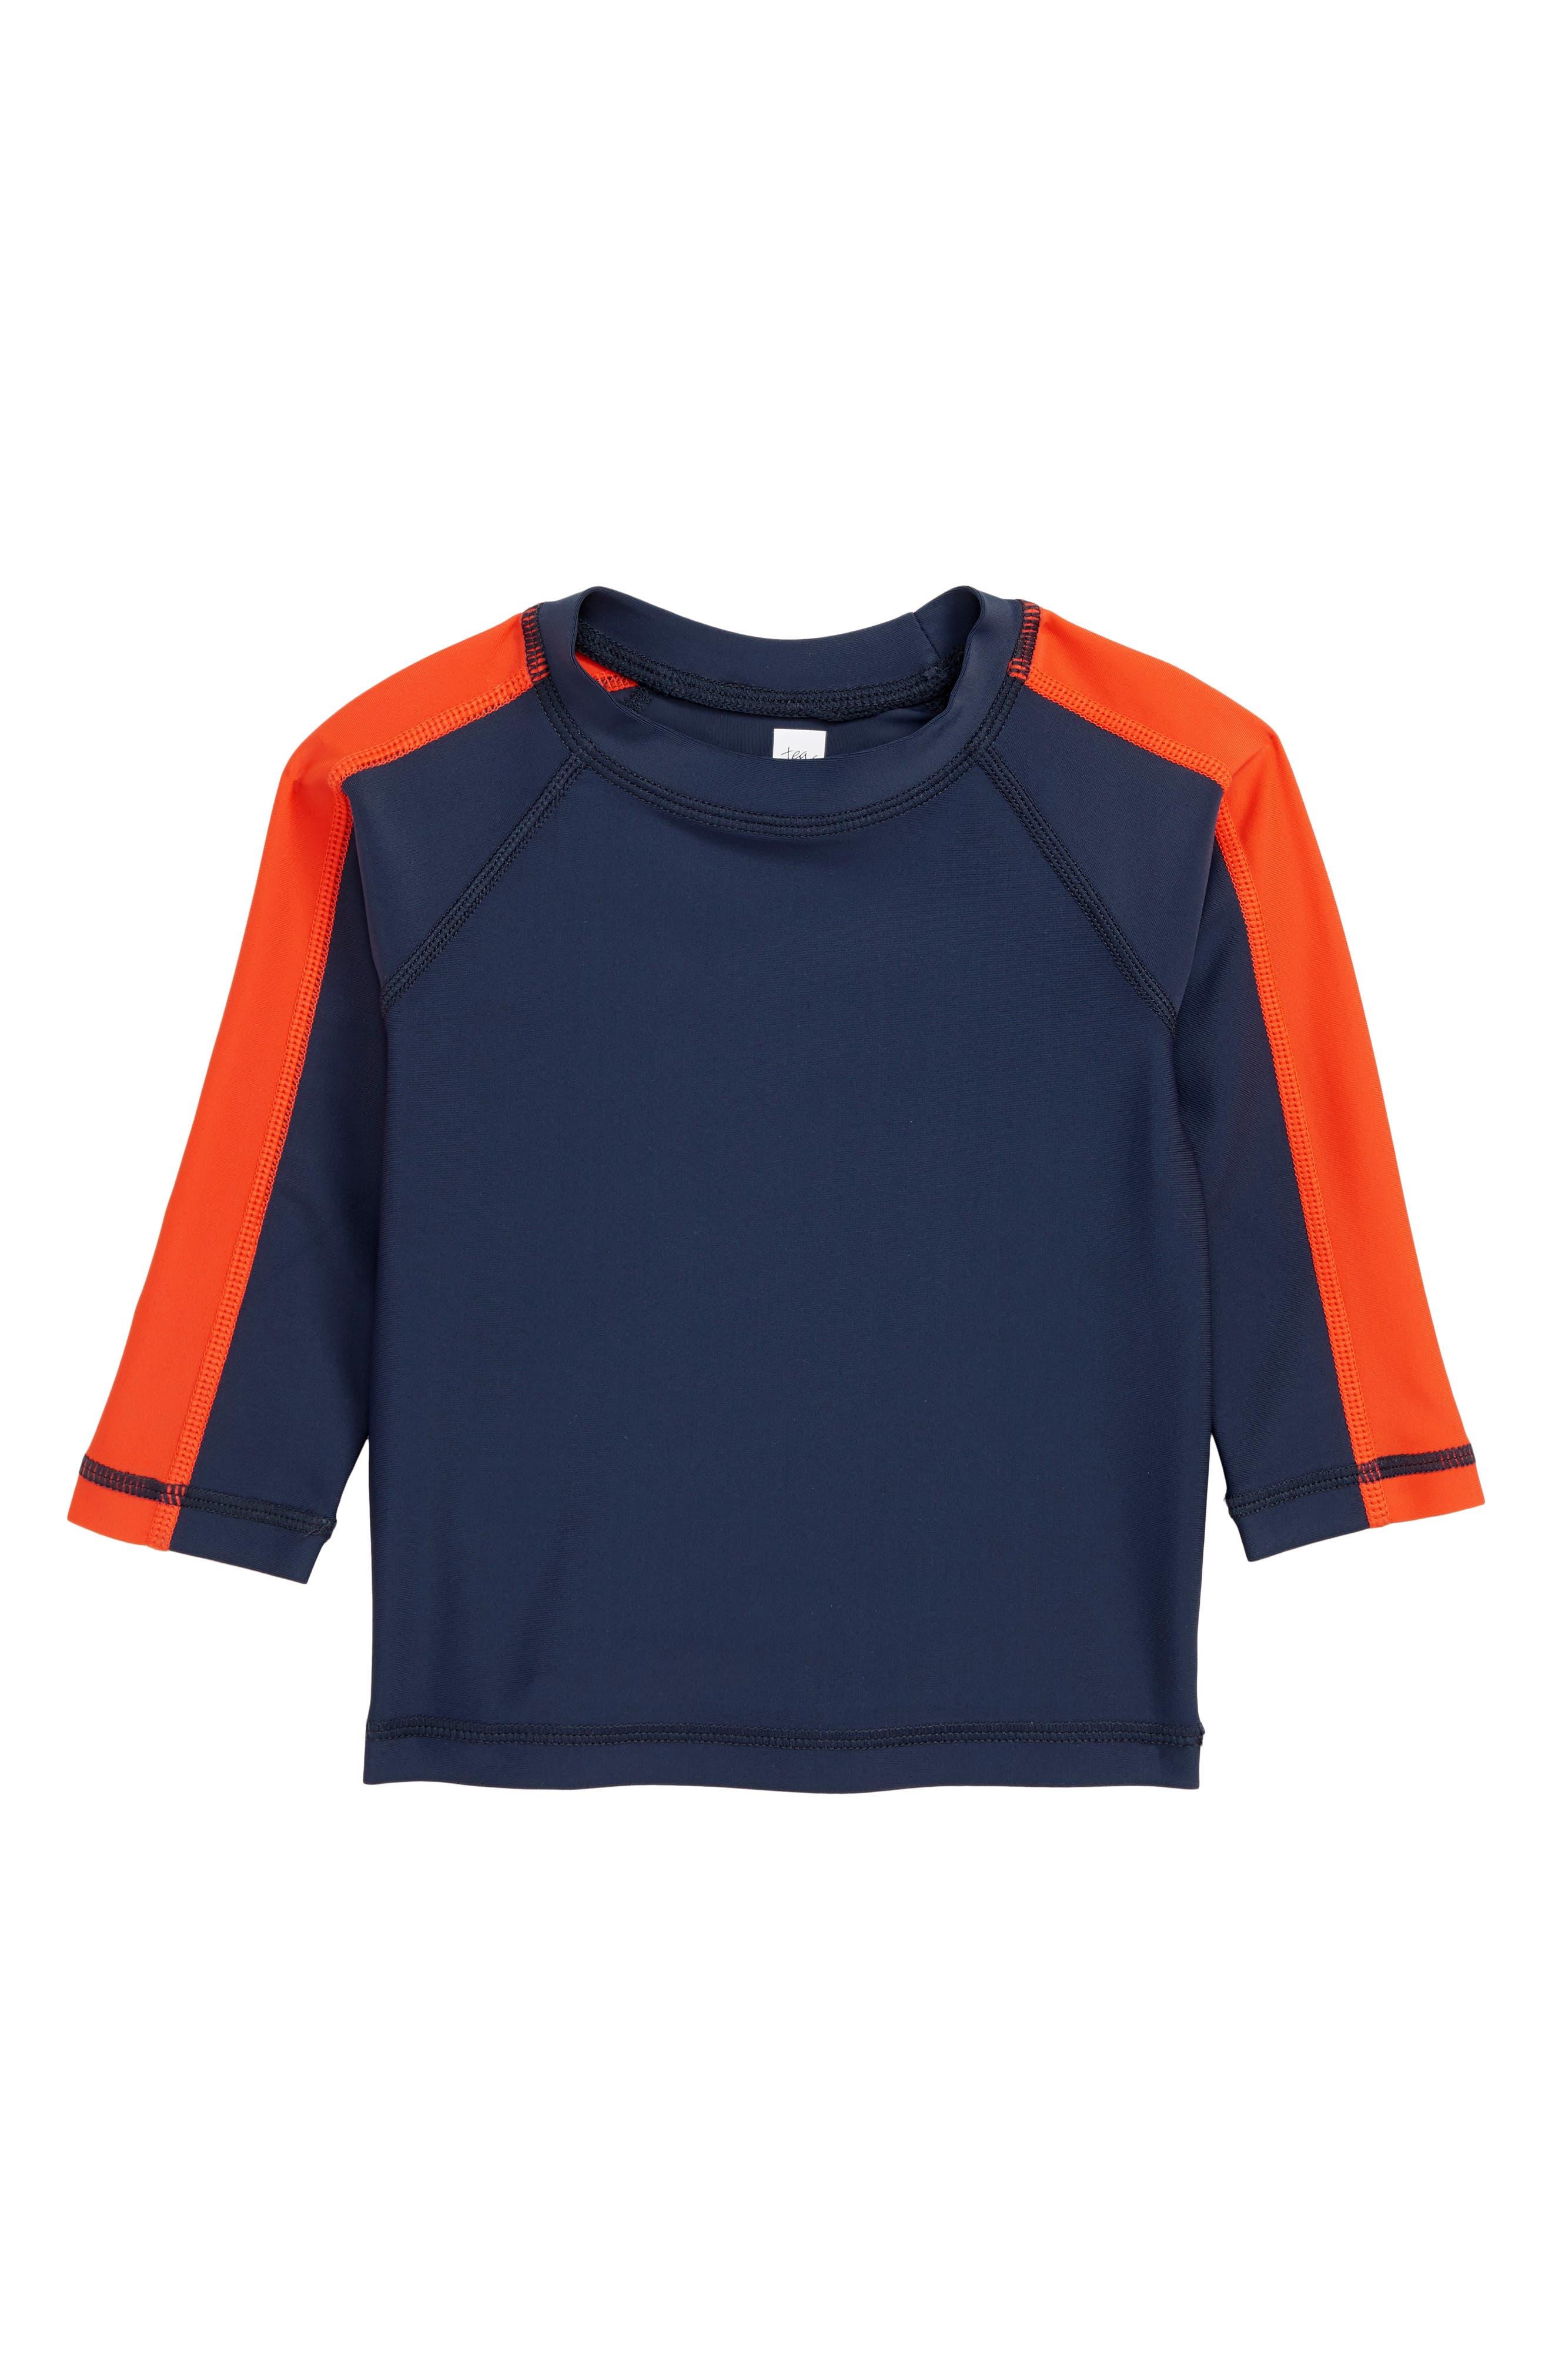 051e264a42 Kids  Tea Collection Apparel  T-Shirts